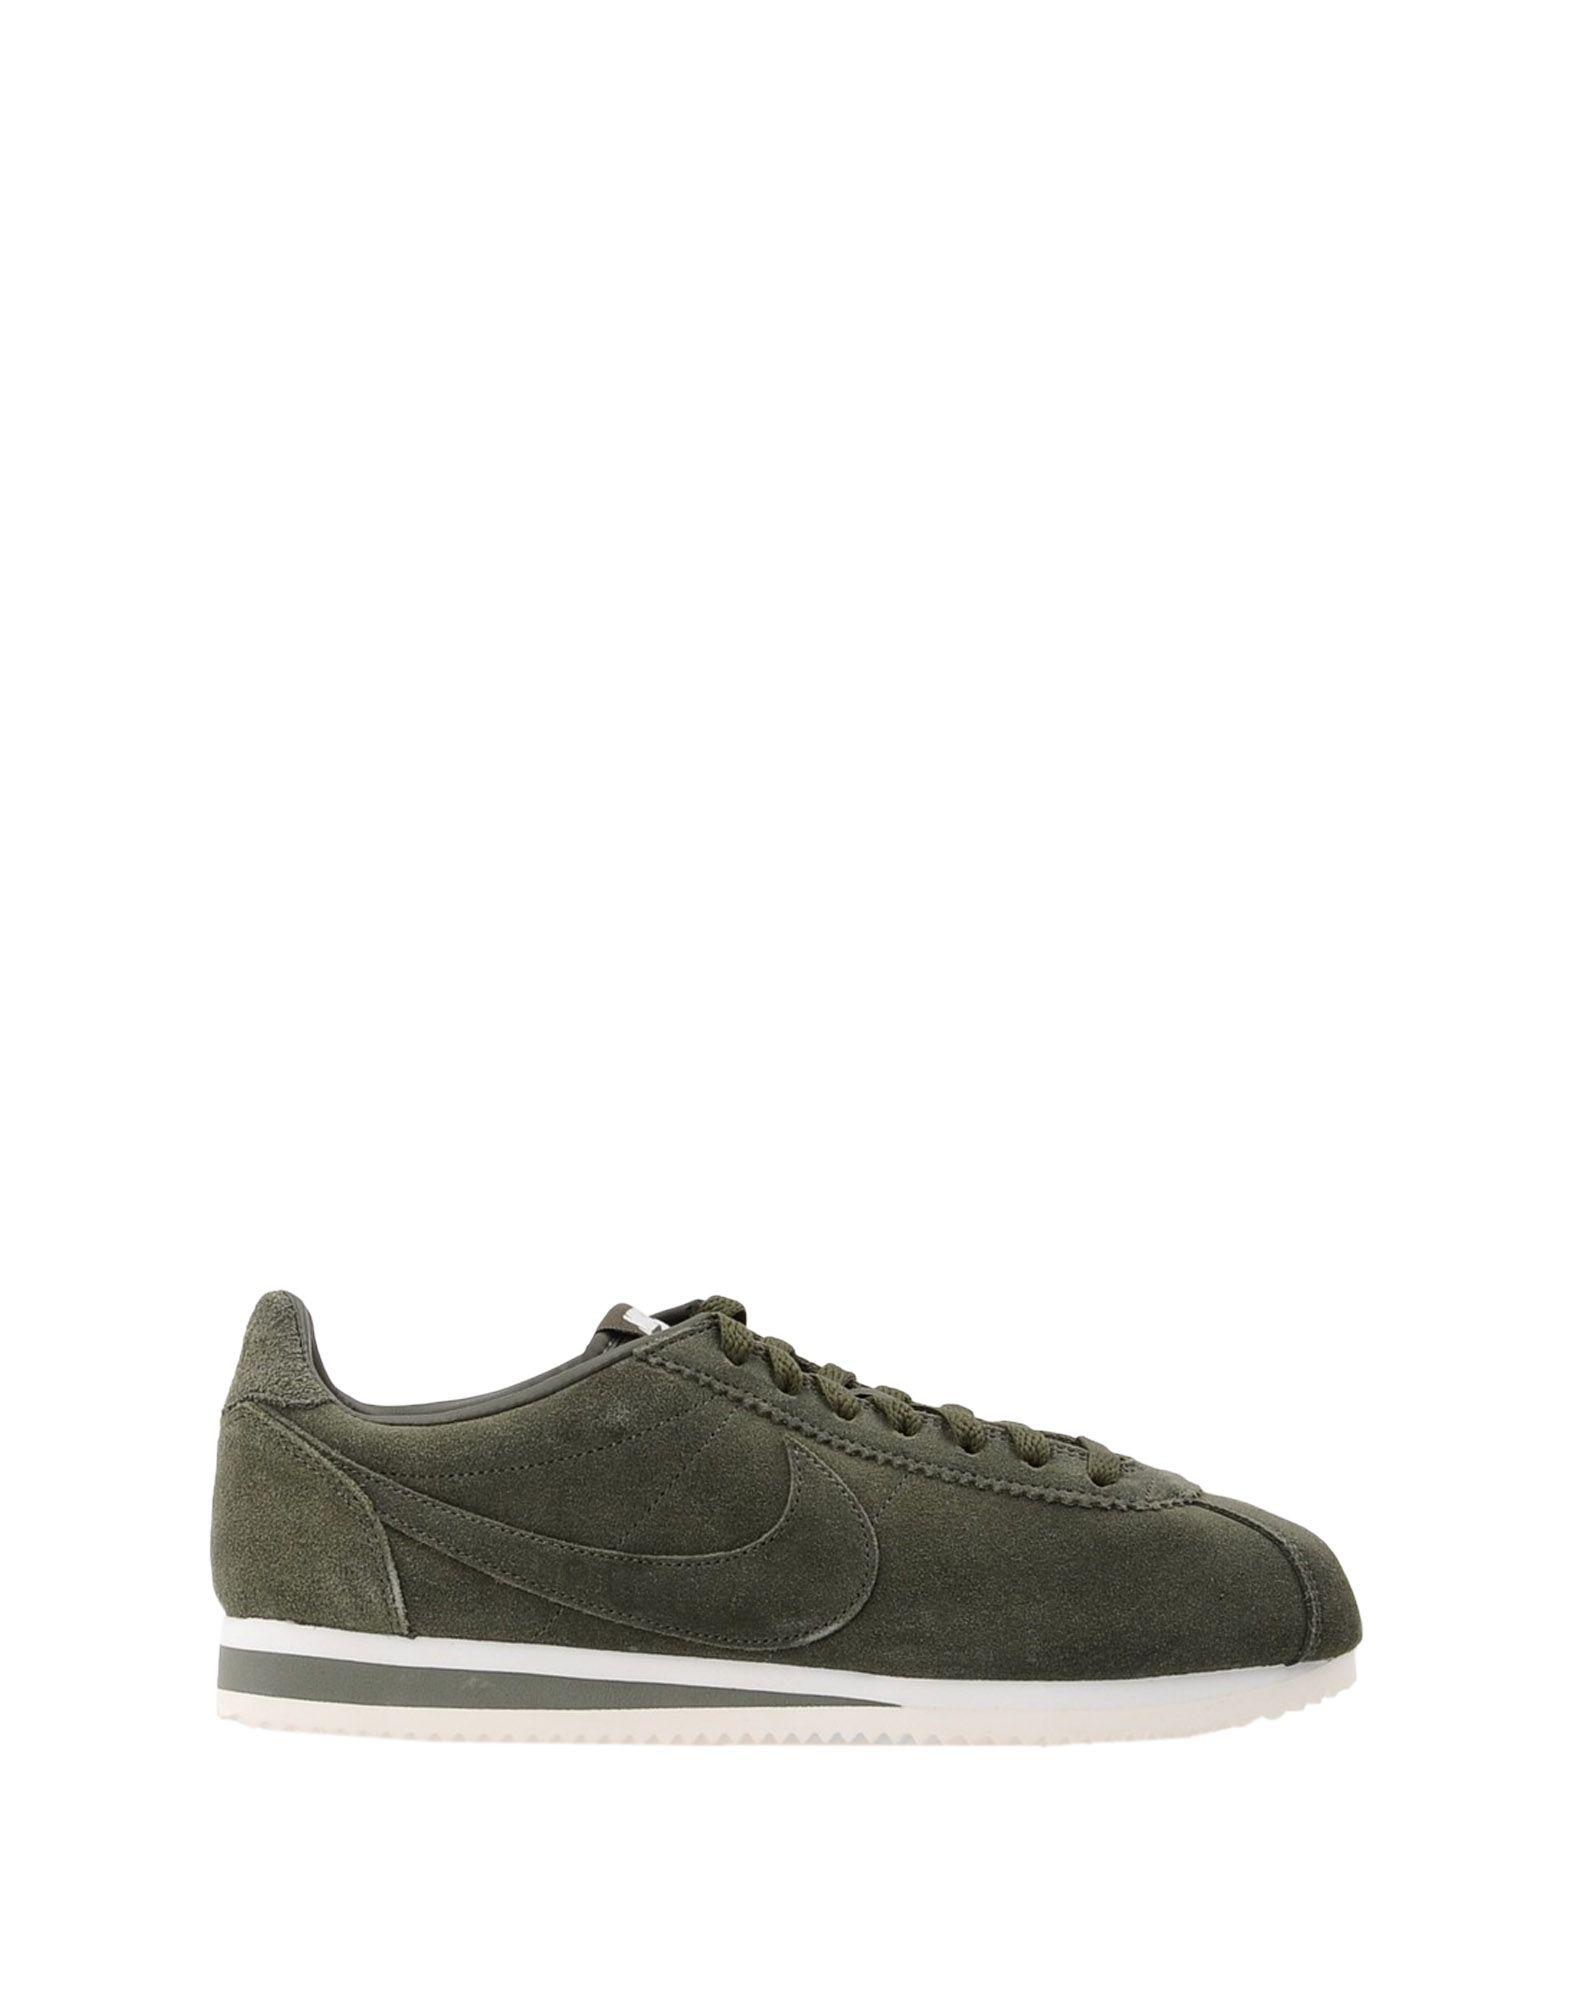 Sneakers Nike Classic Cortez Se - Homme - Sneakers Nike sur